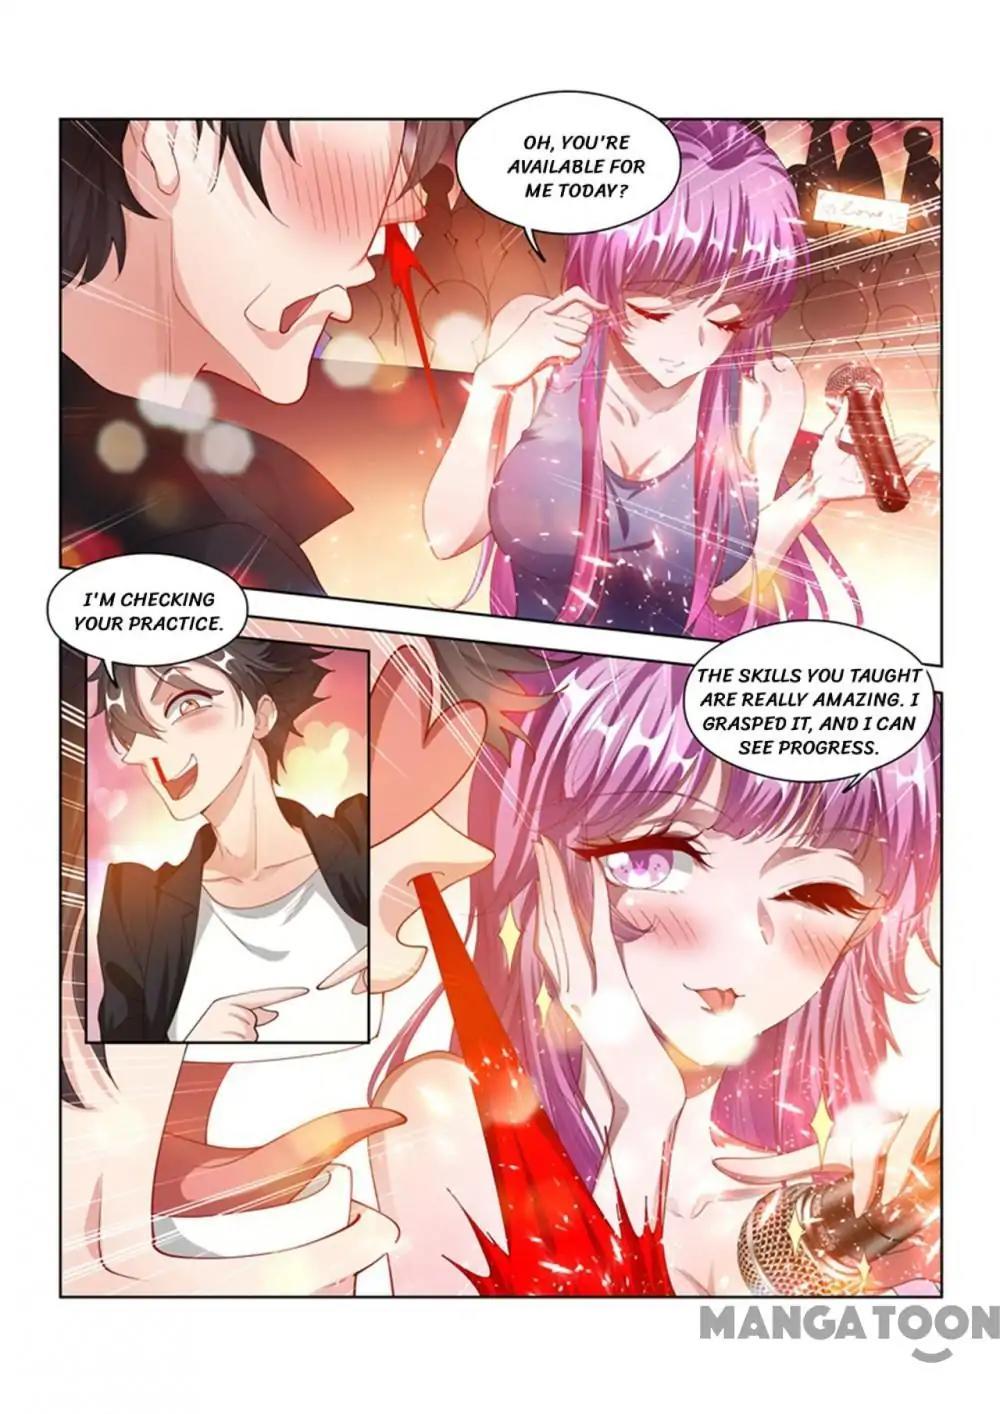 https://img2.nineanime.com/comics/pic2/27/25371/932708/f8dc989f5ef8d43d2e701a44b6c6b6f6.jpg Page 1